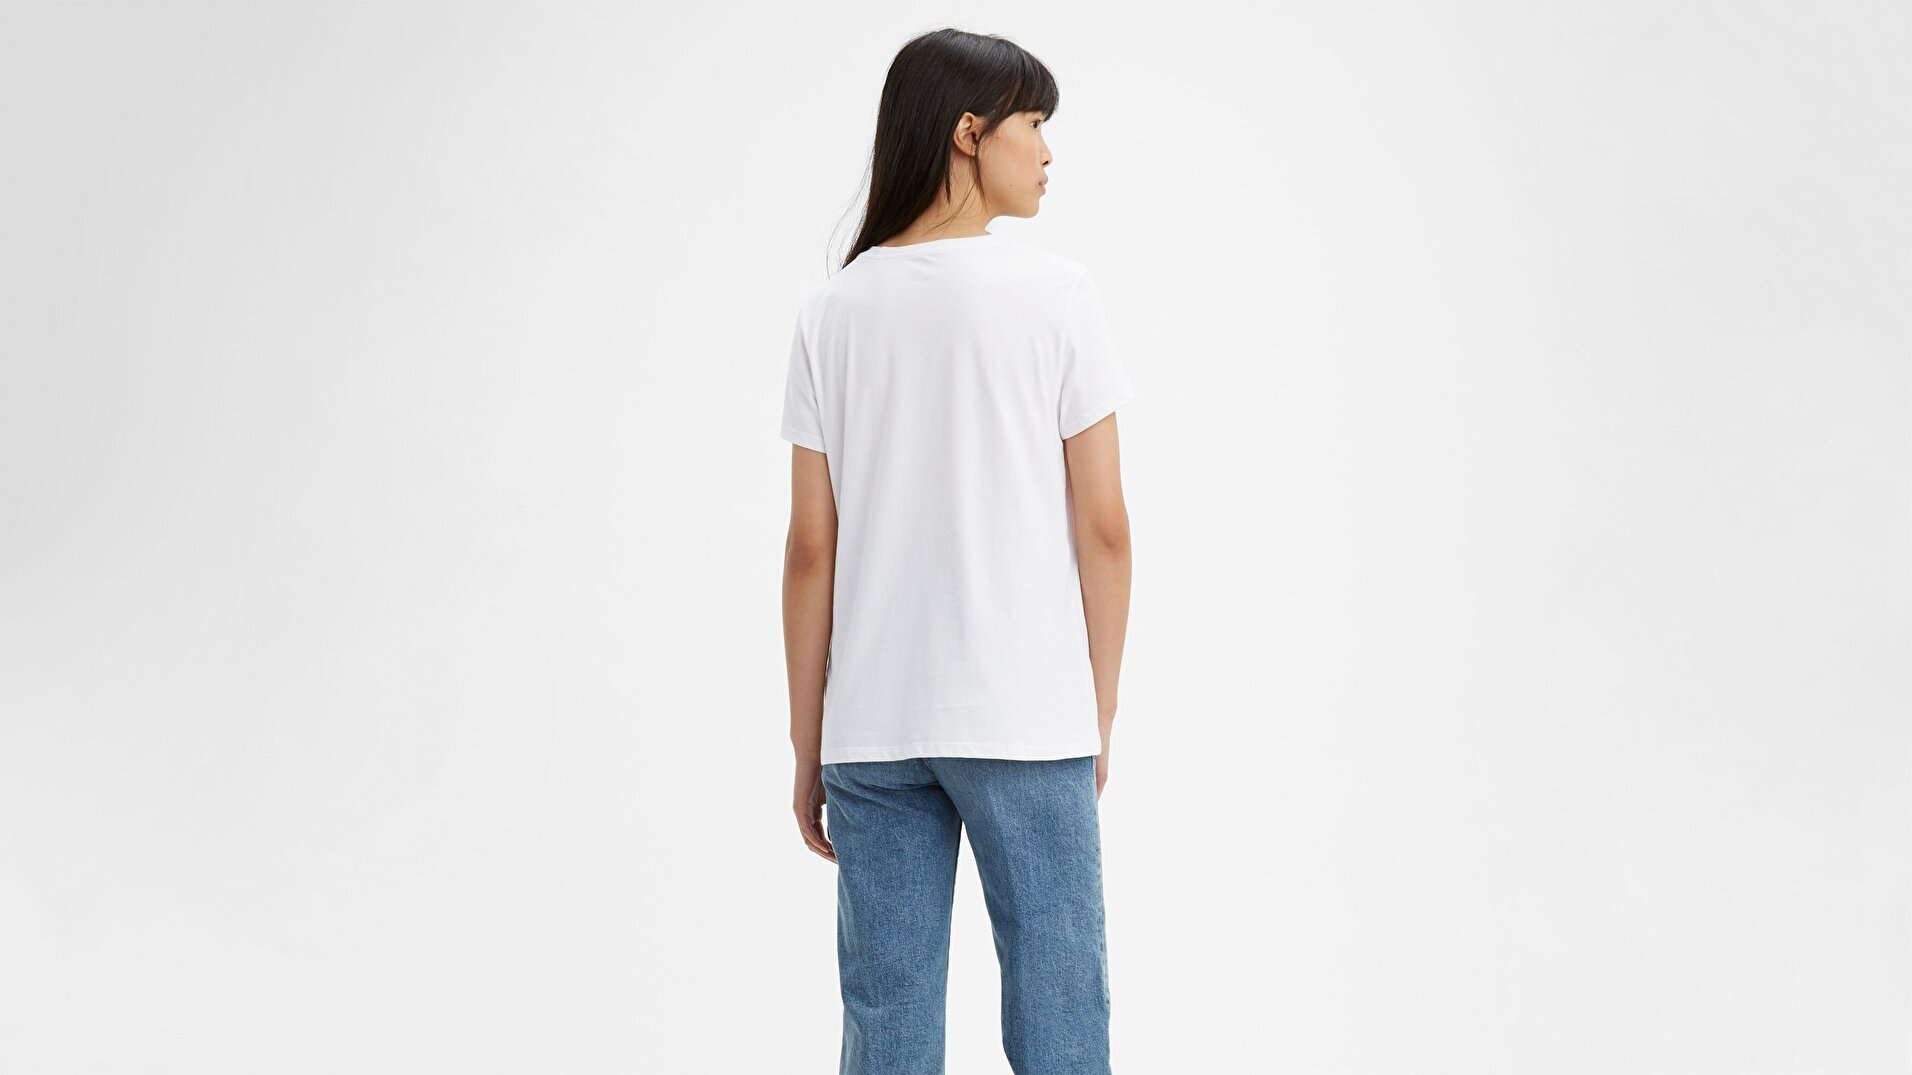 The Perfect Tee Tr Sportswear Beyaz Kadın Tişört